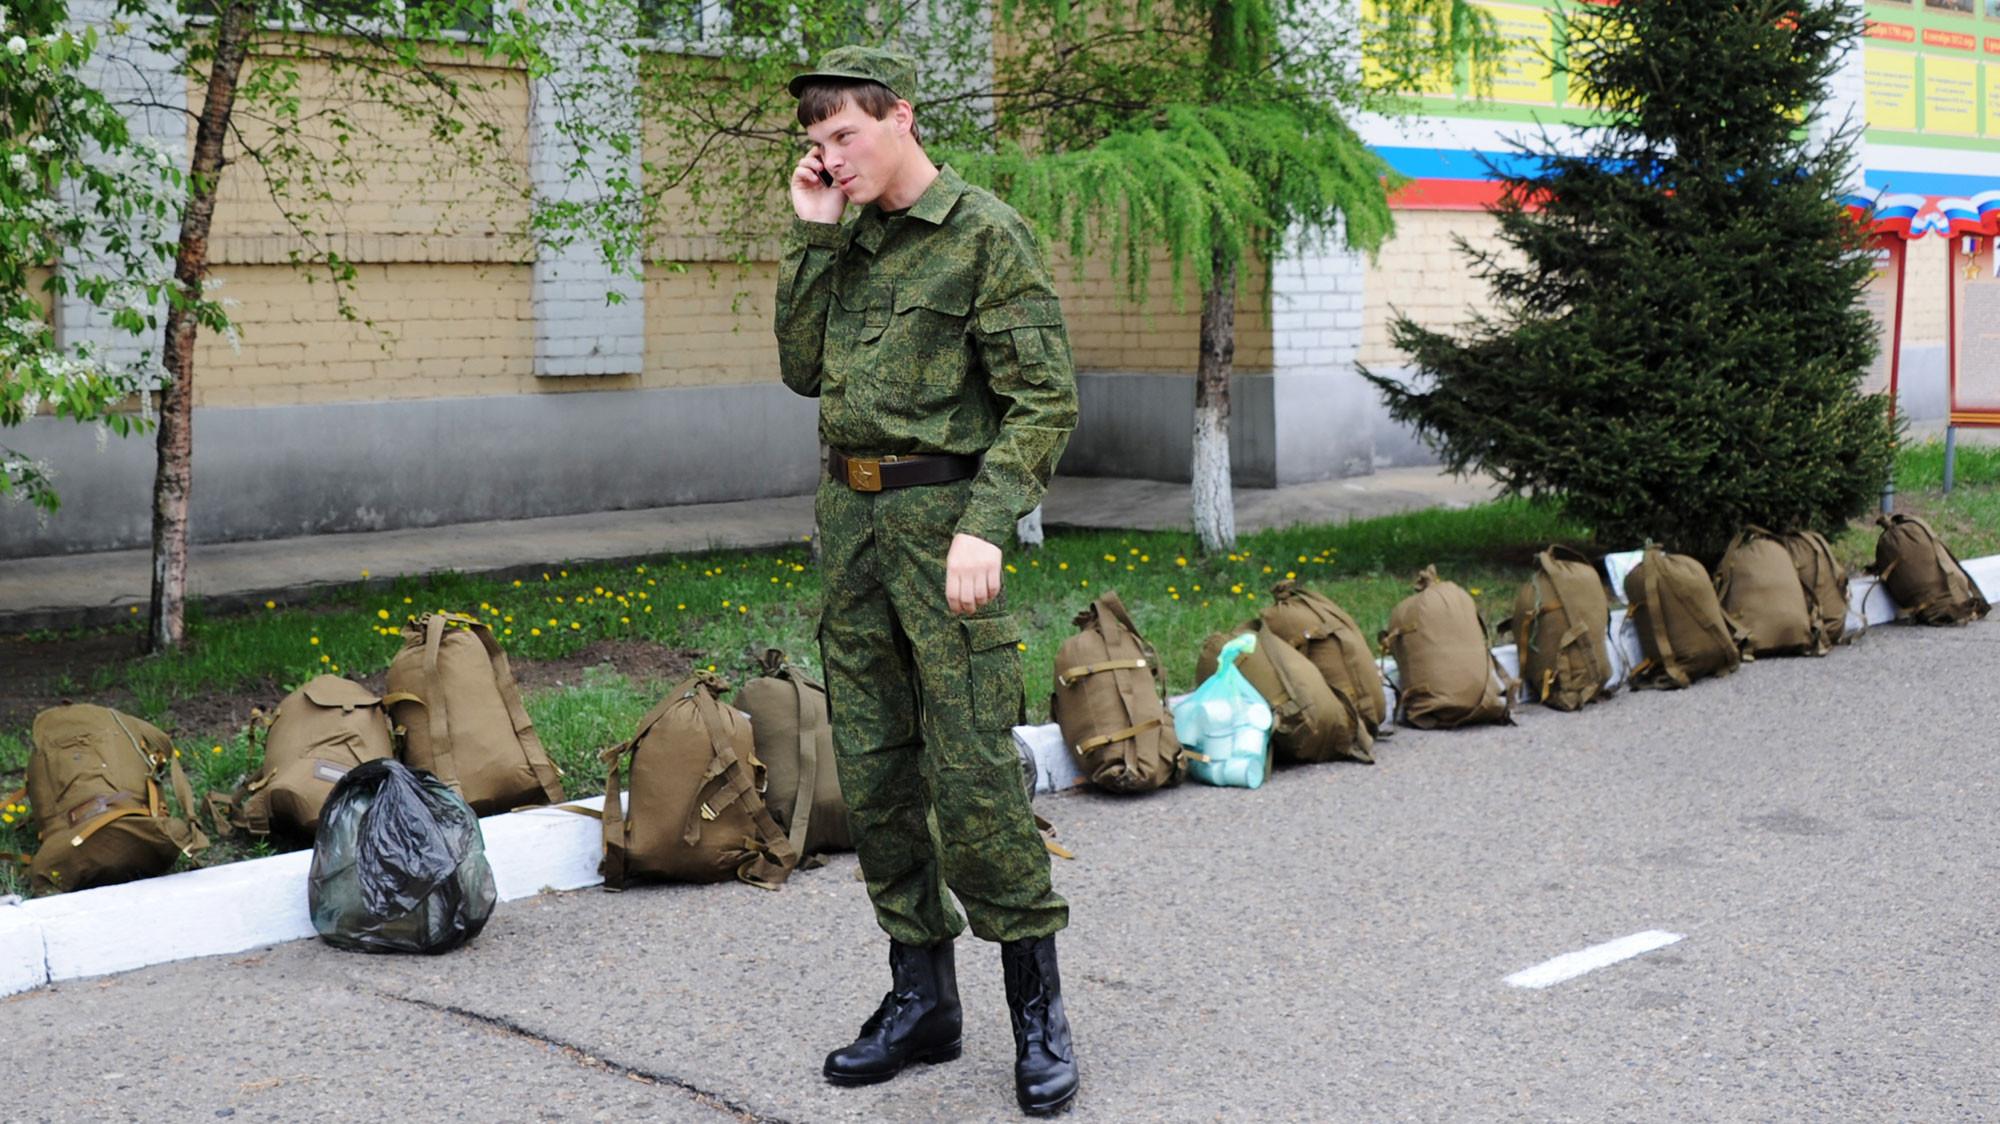 <p><span>Фото: &copy; РИА Новости / Евгений Епанчинцев</span></p>